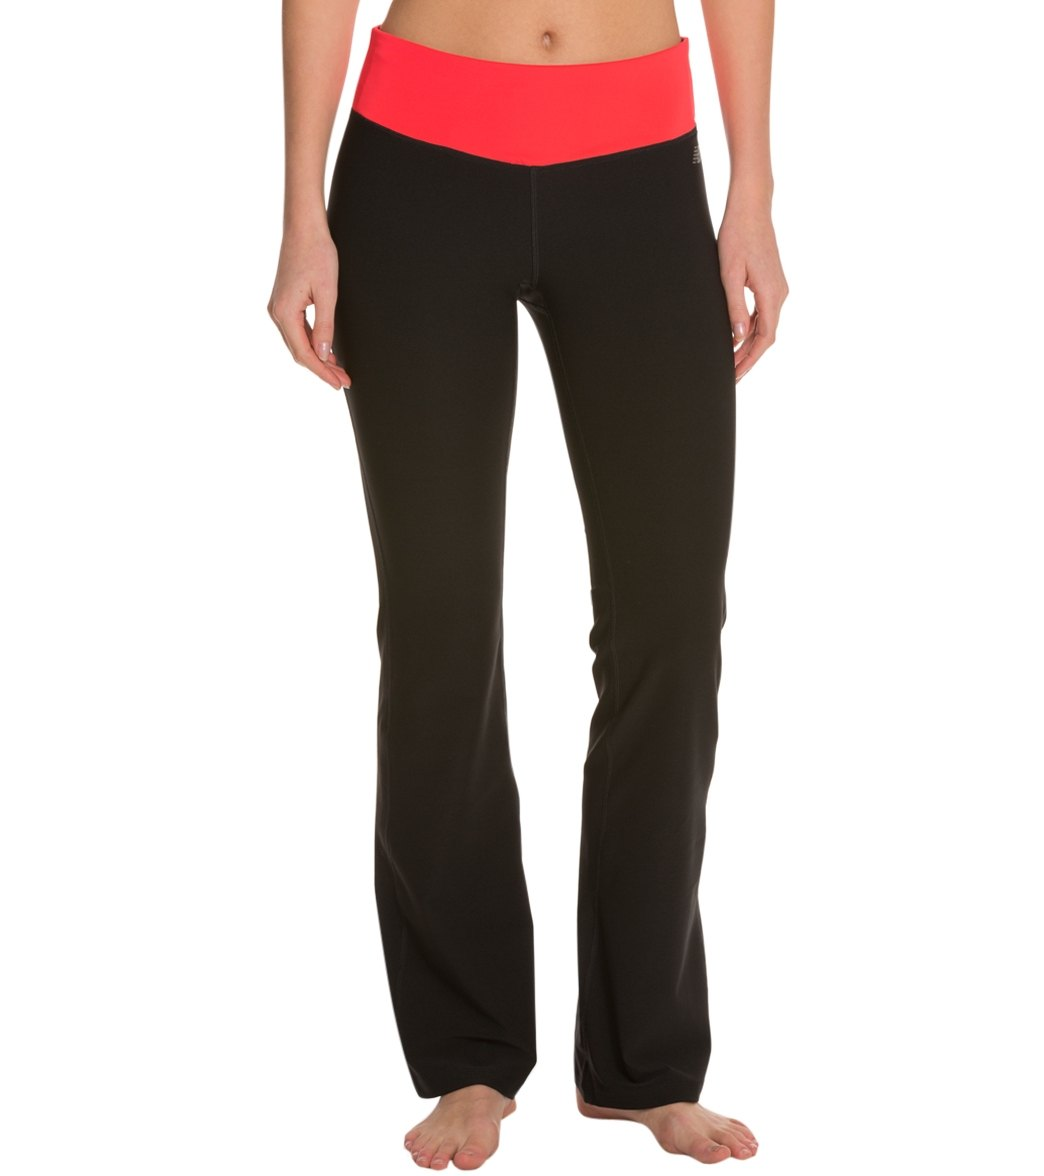 a36d3d5f26fc4 ... New Balance Women's Ultimate Bootcut Yoga Pants. Play Video. MODEL  MEASUREMENTS